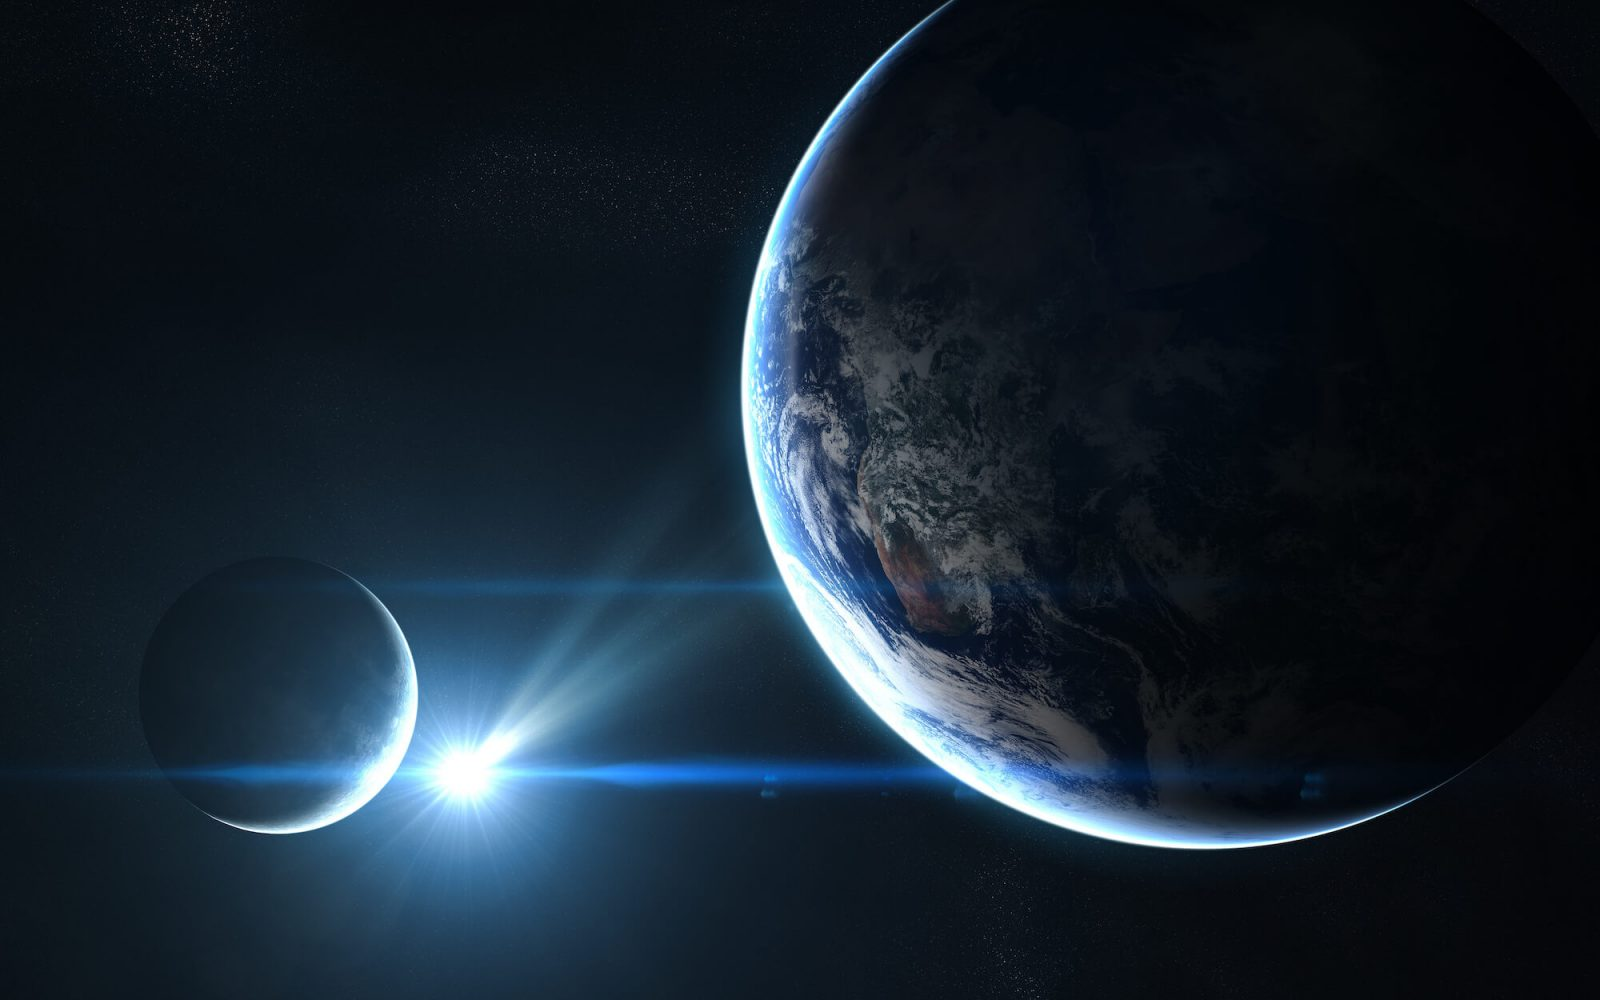 rayos láser asteroides